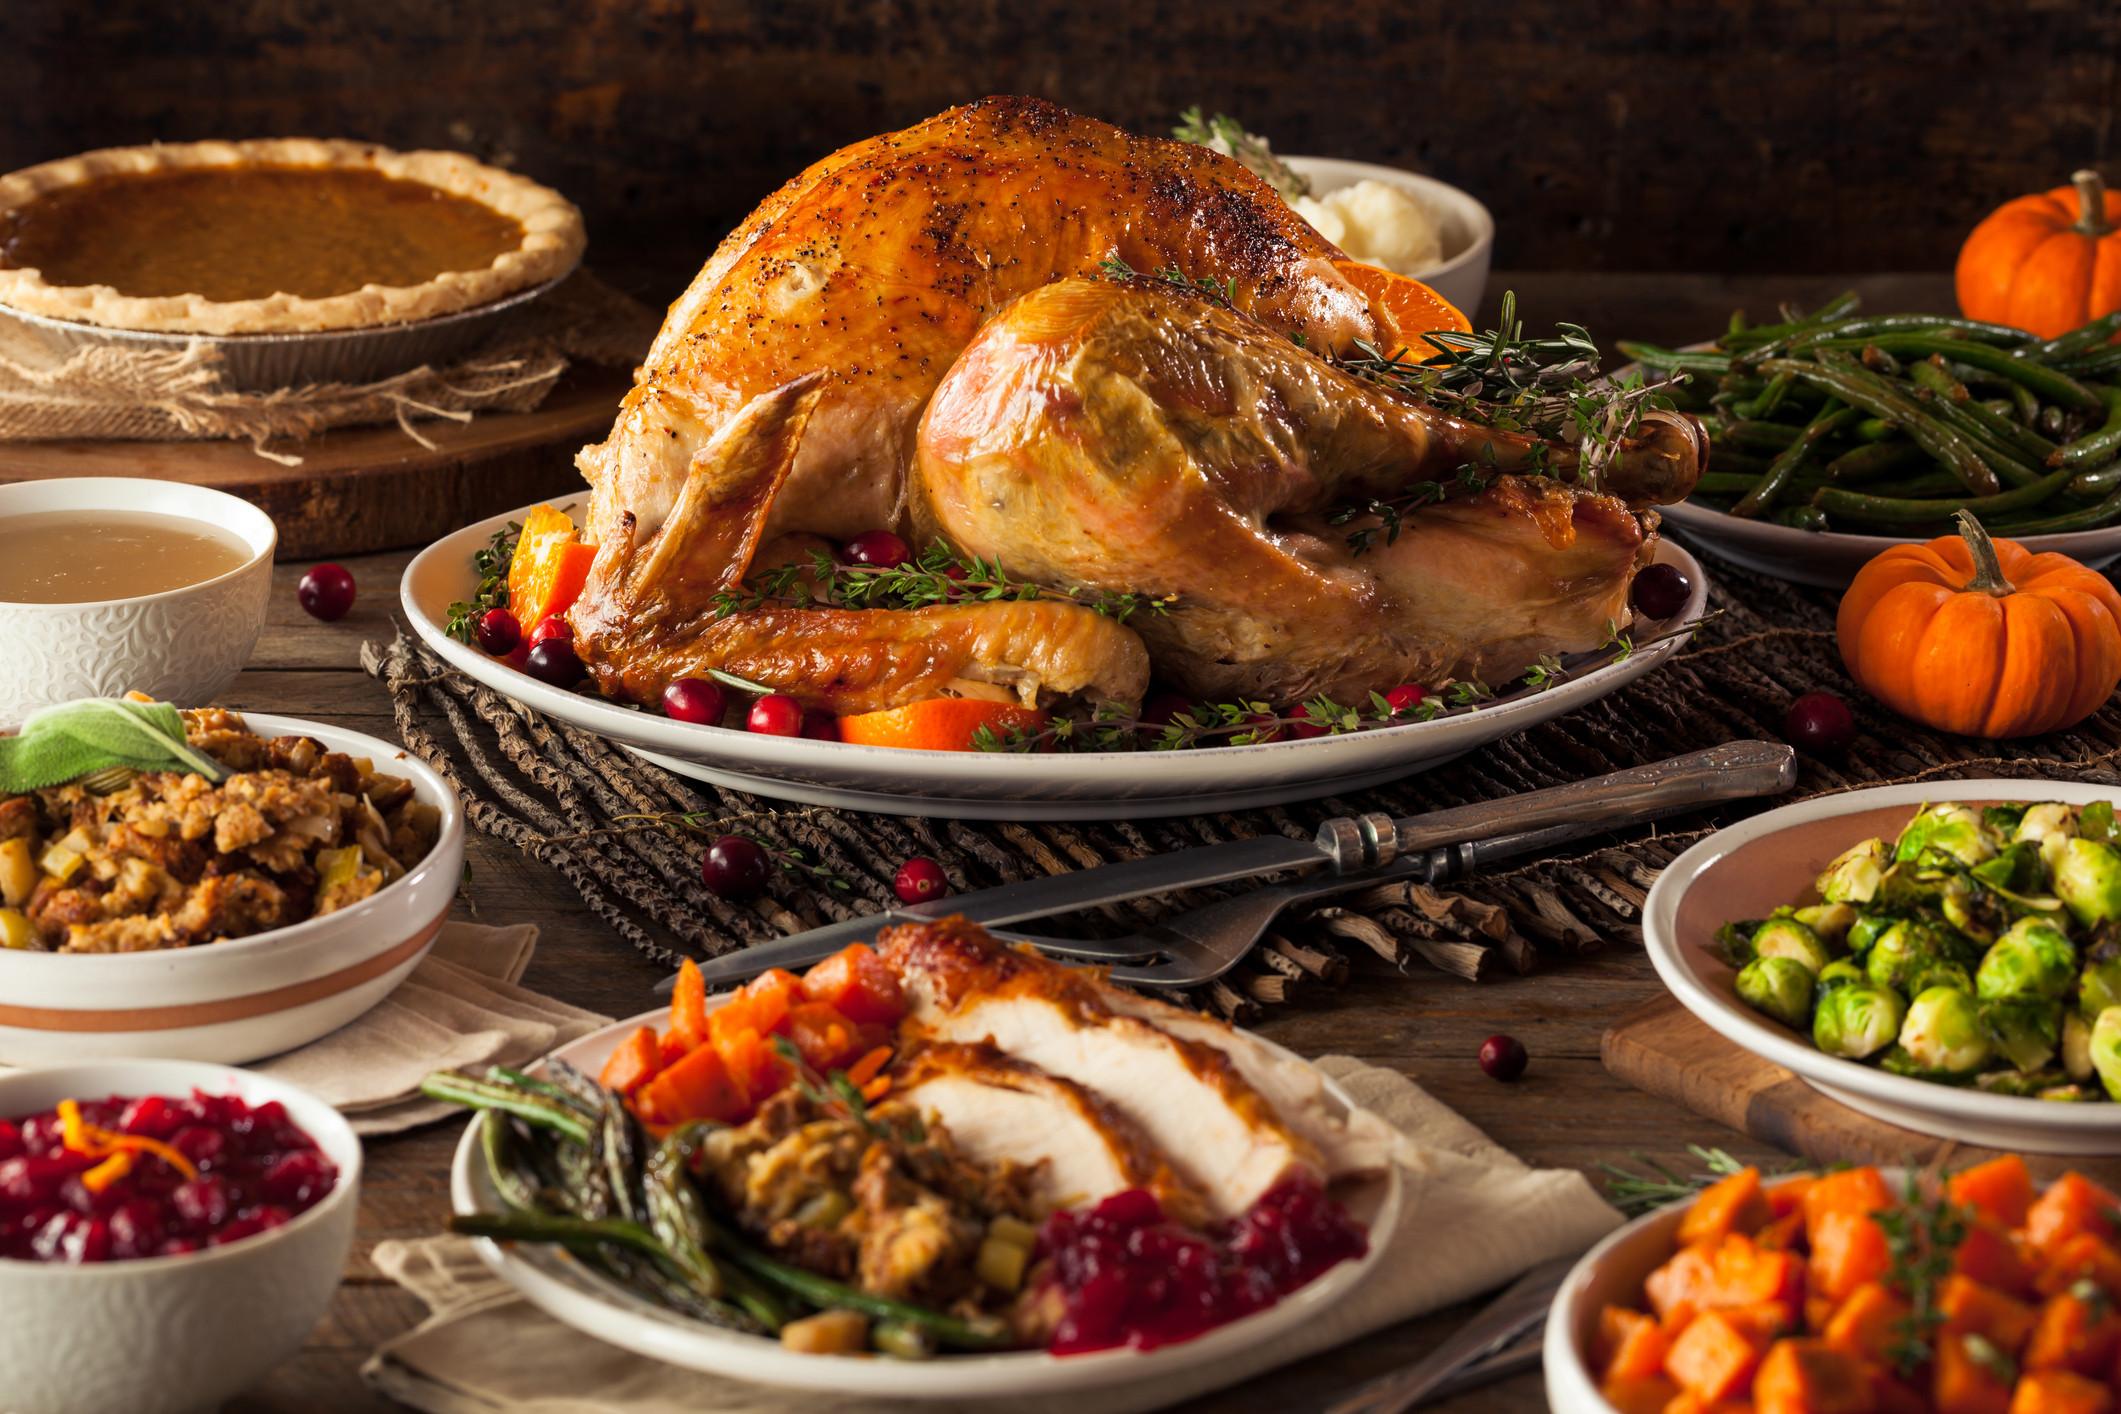 Cooked Thanksgiving Turkey  Let s Talk Turkey Thanksgiving Kitchen Safety Tips The